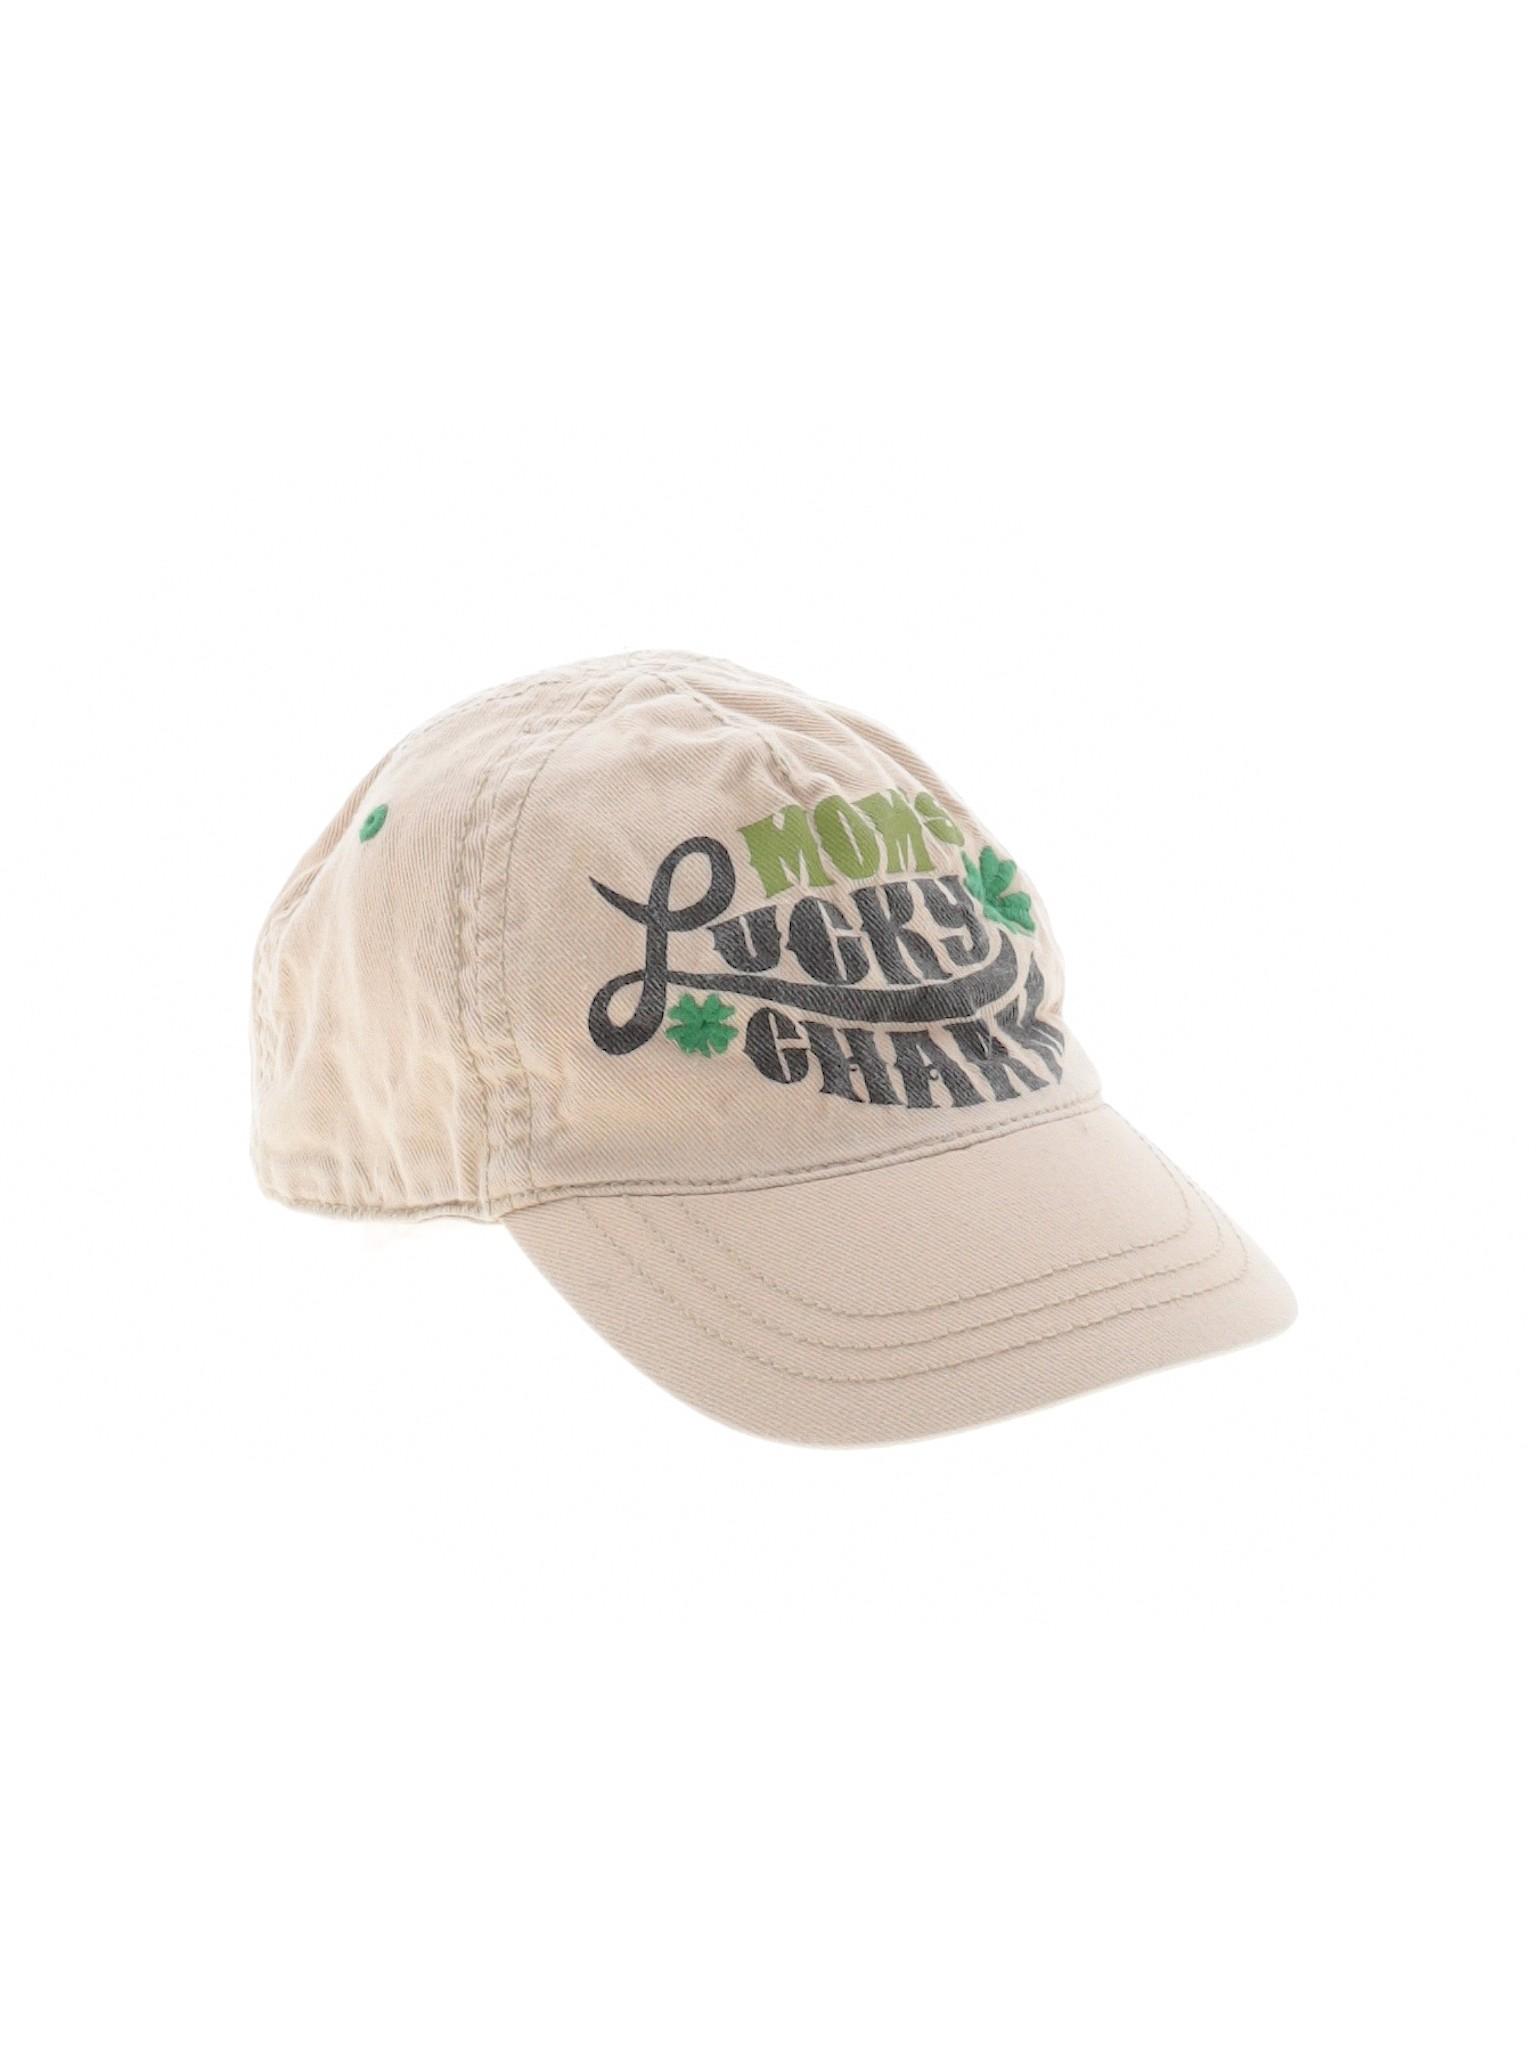 Old Navy Boys Ivory Baseball Cap One Size Ebay